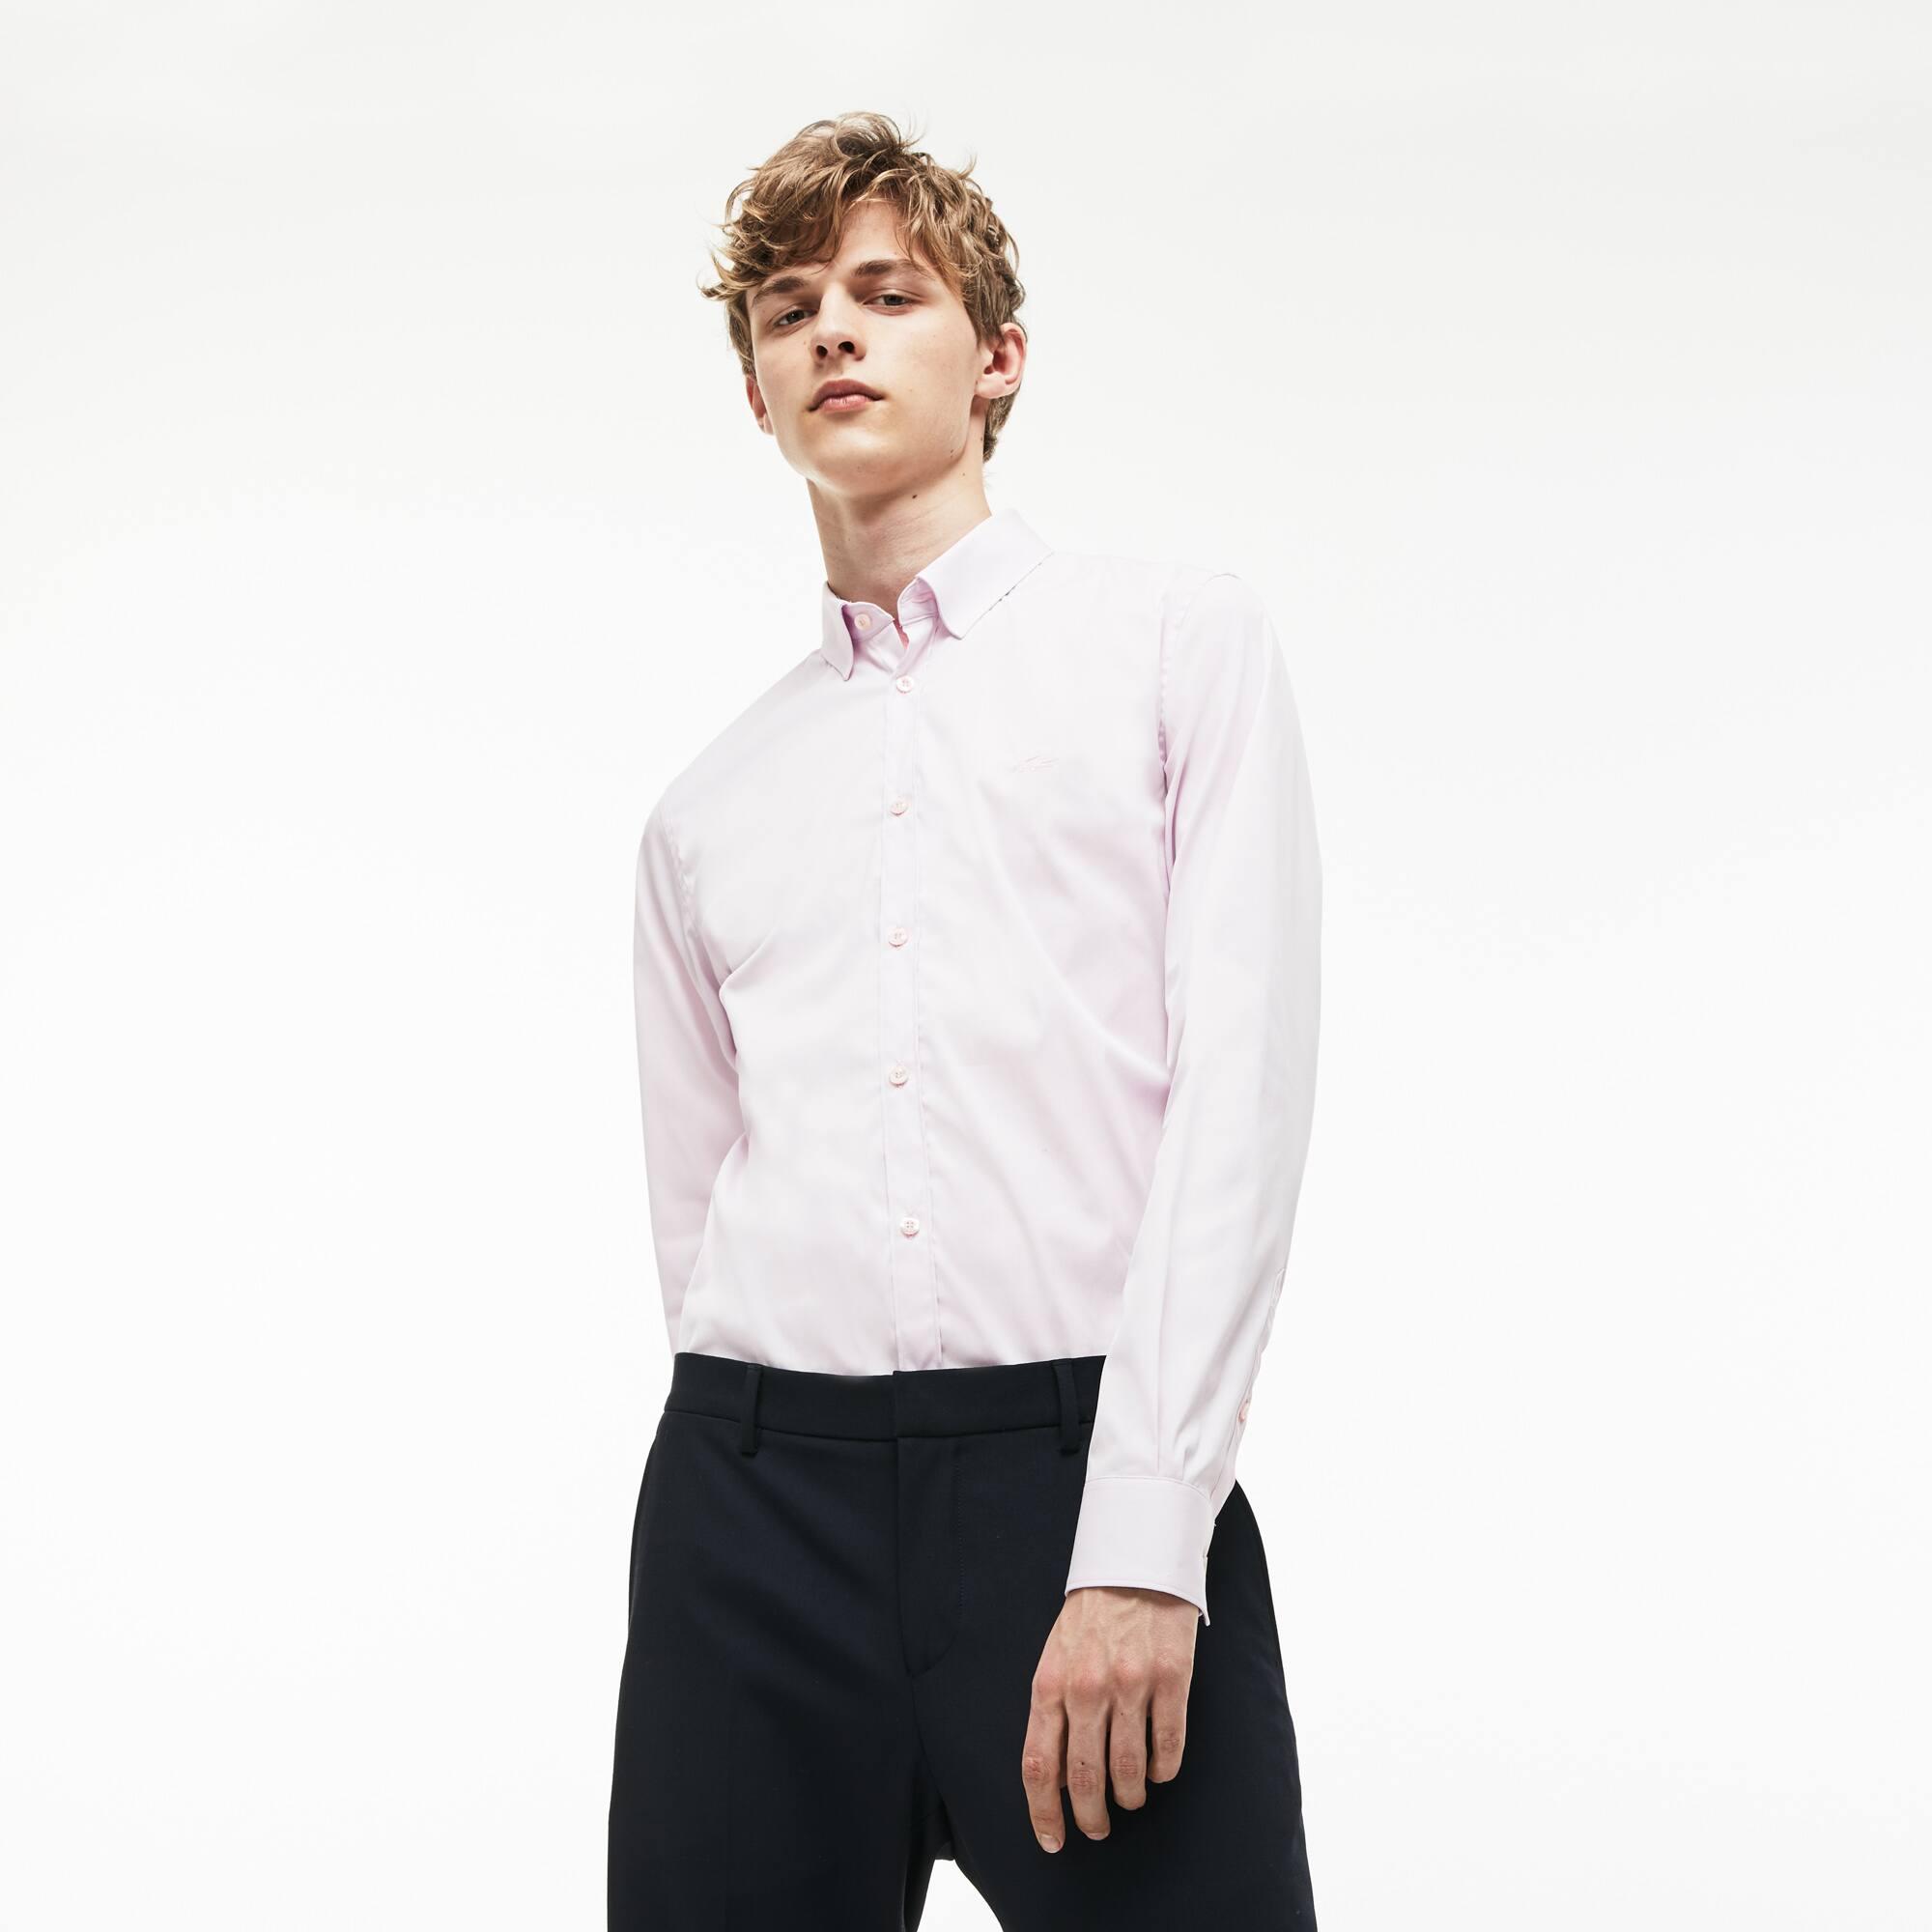 9f5d94ba9fe Camisas para hombre